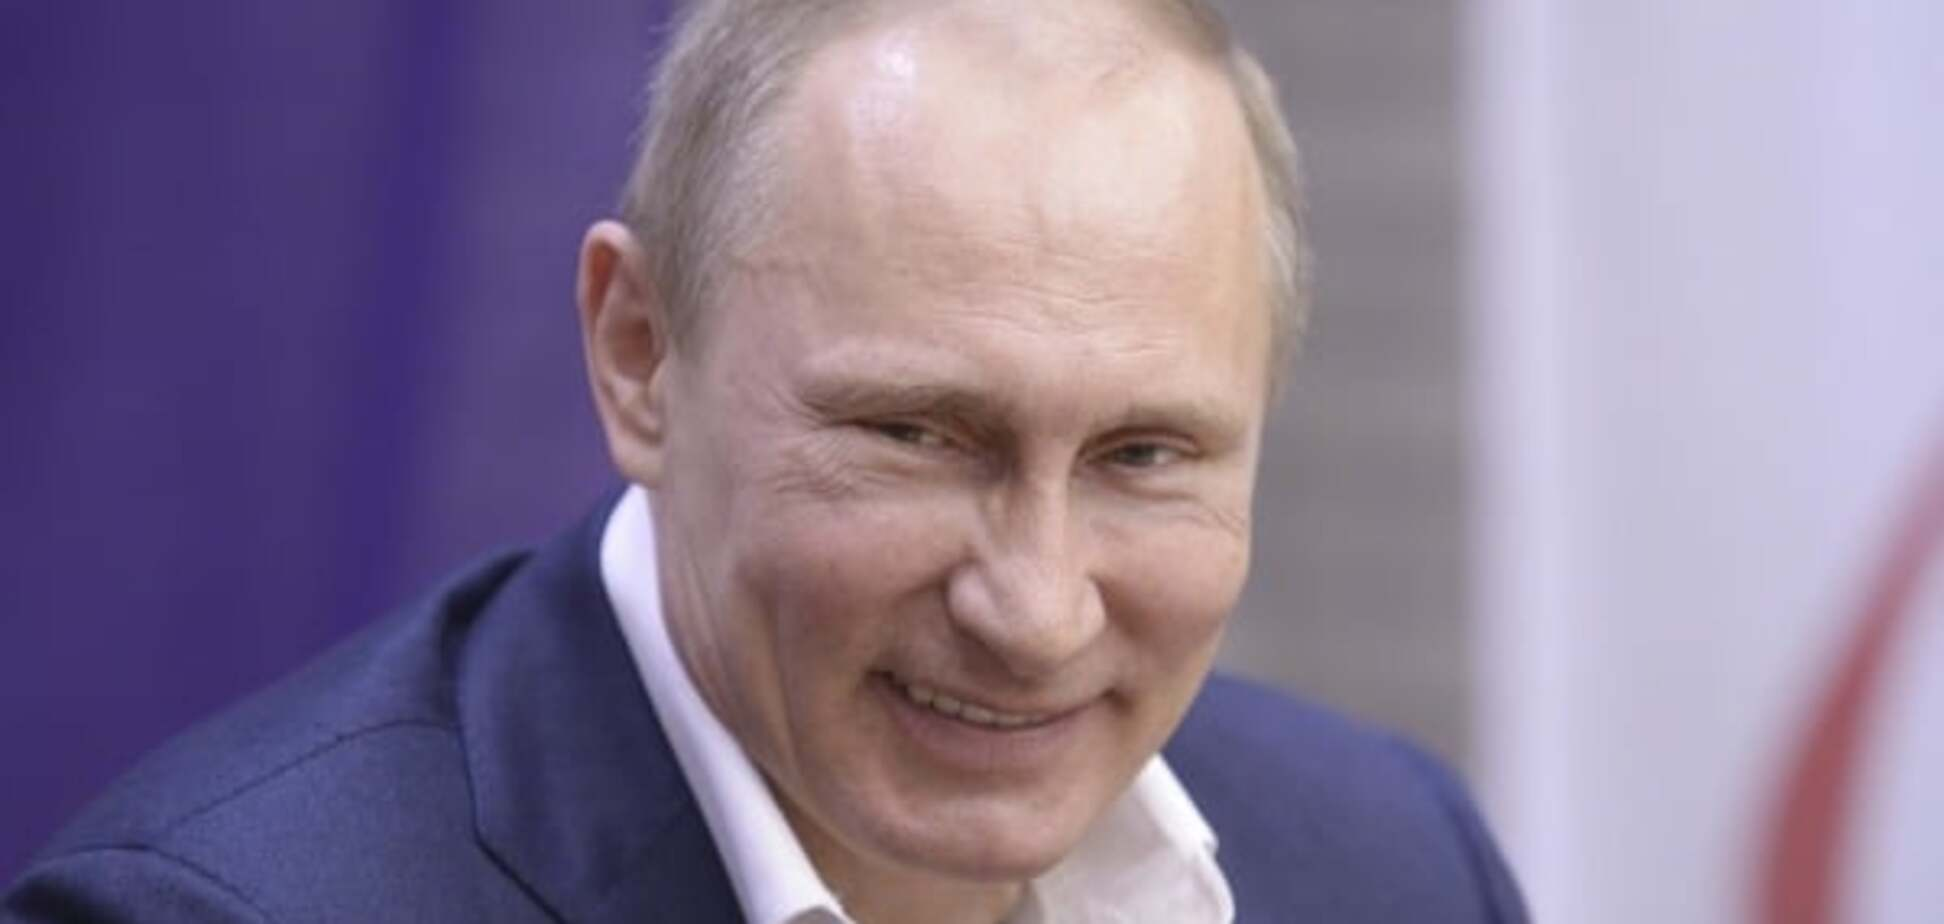 Почему все так легко сходит Путину с рук?